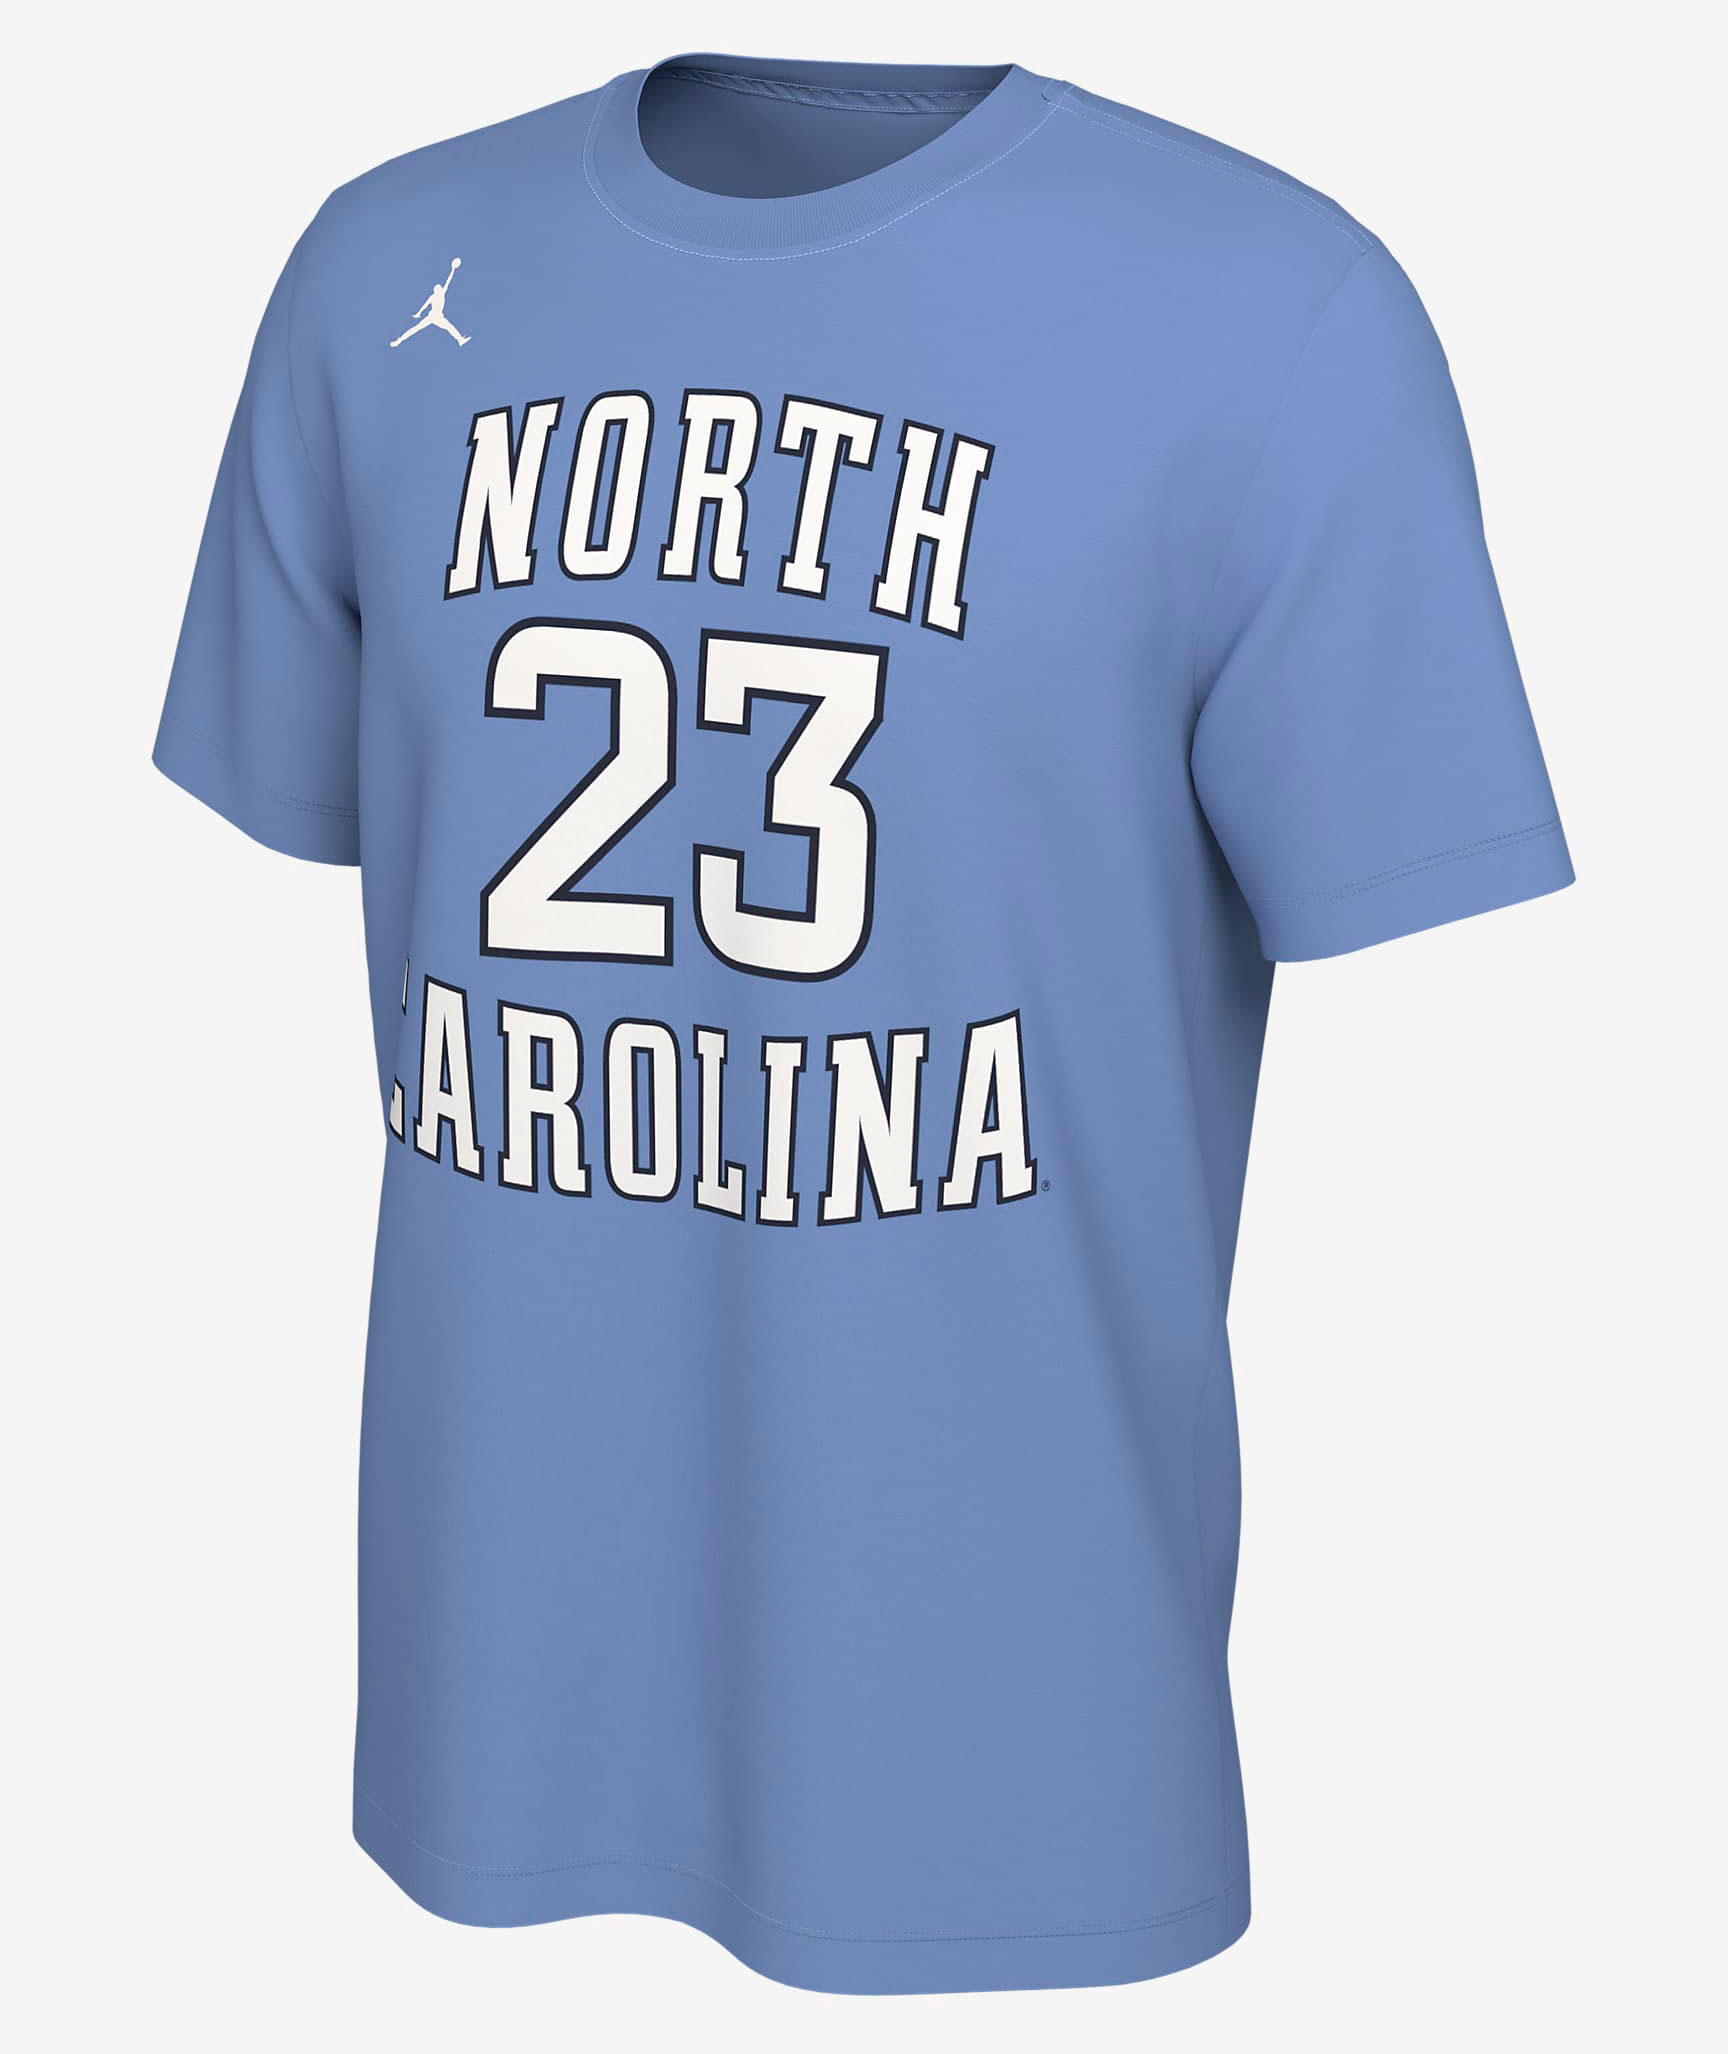 michael-jordan-unc-tar-heels-college-shirt-carolina-blue-1